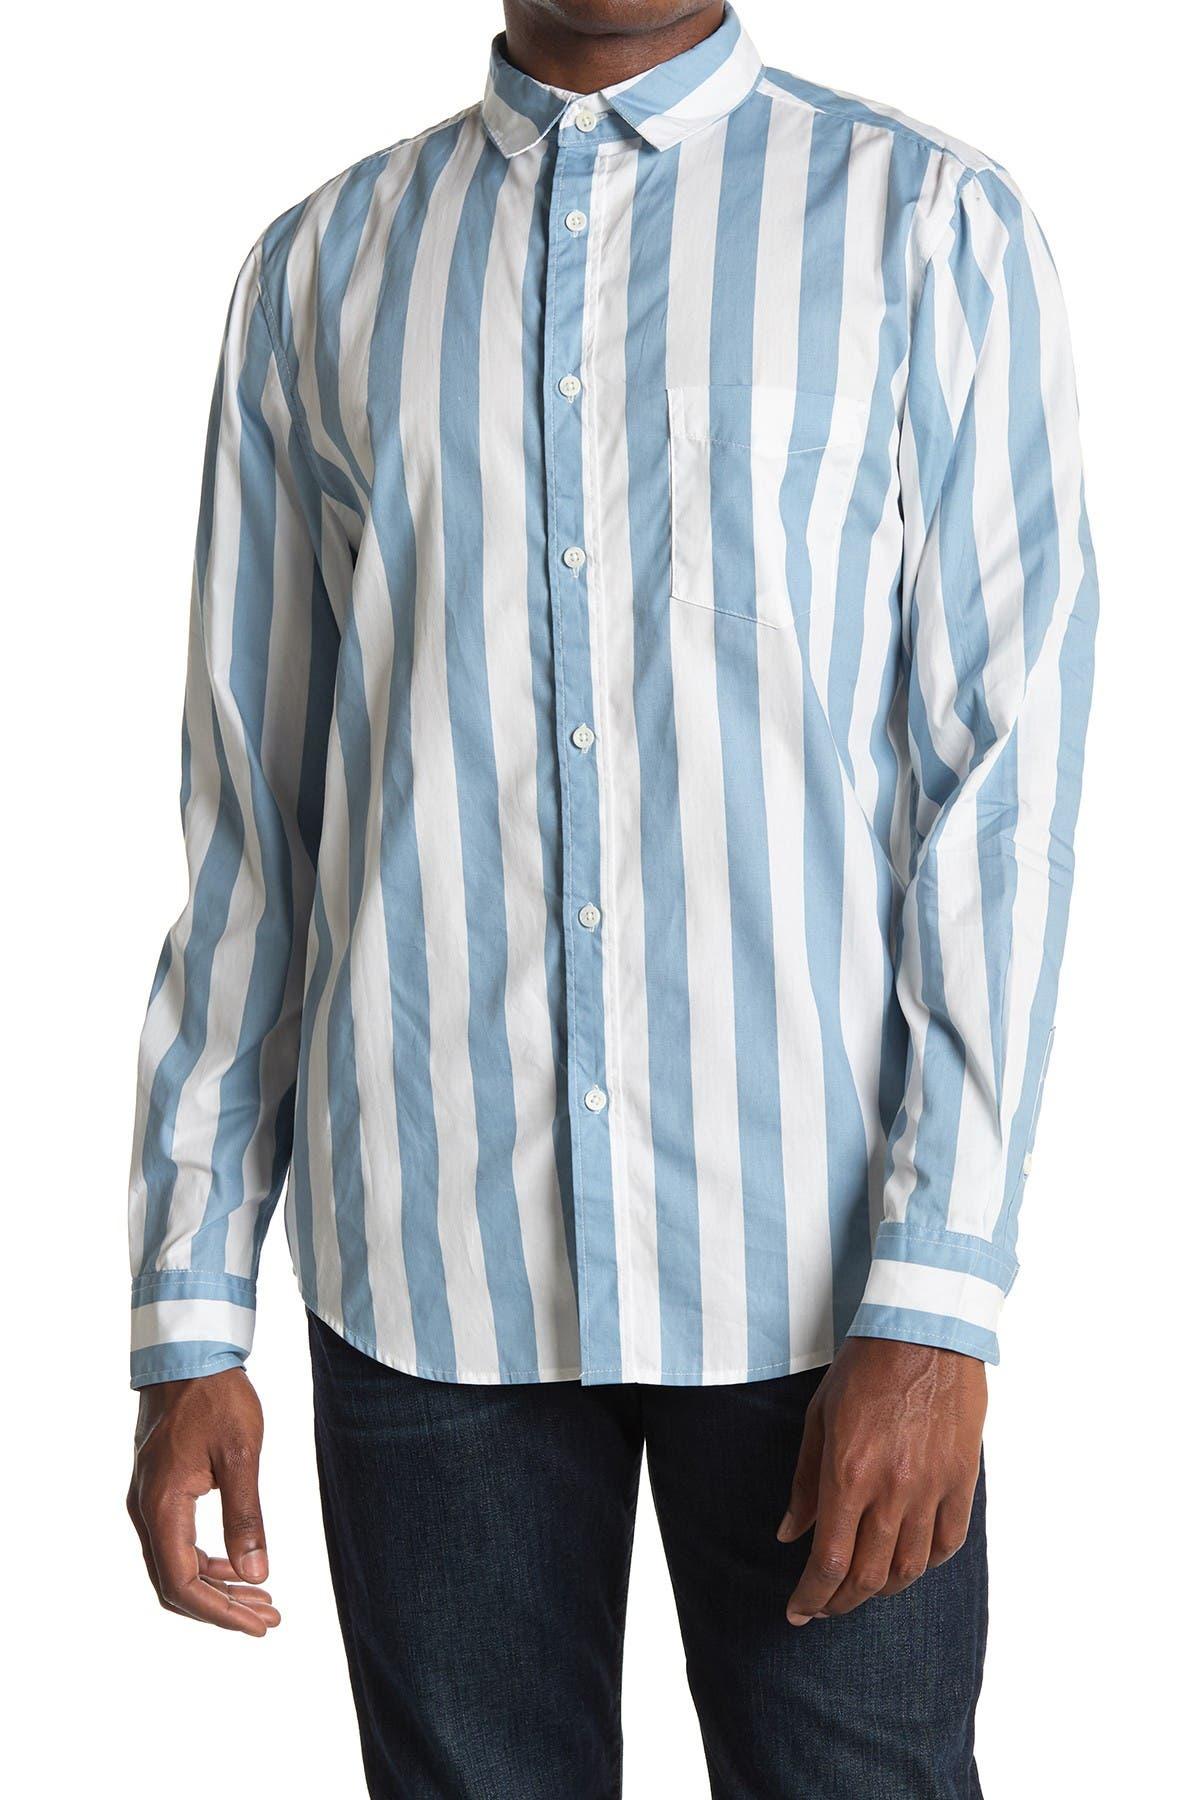 Image of Sovereign Code Mirage Stripe Print Shirt